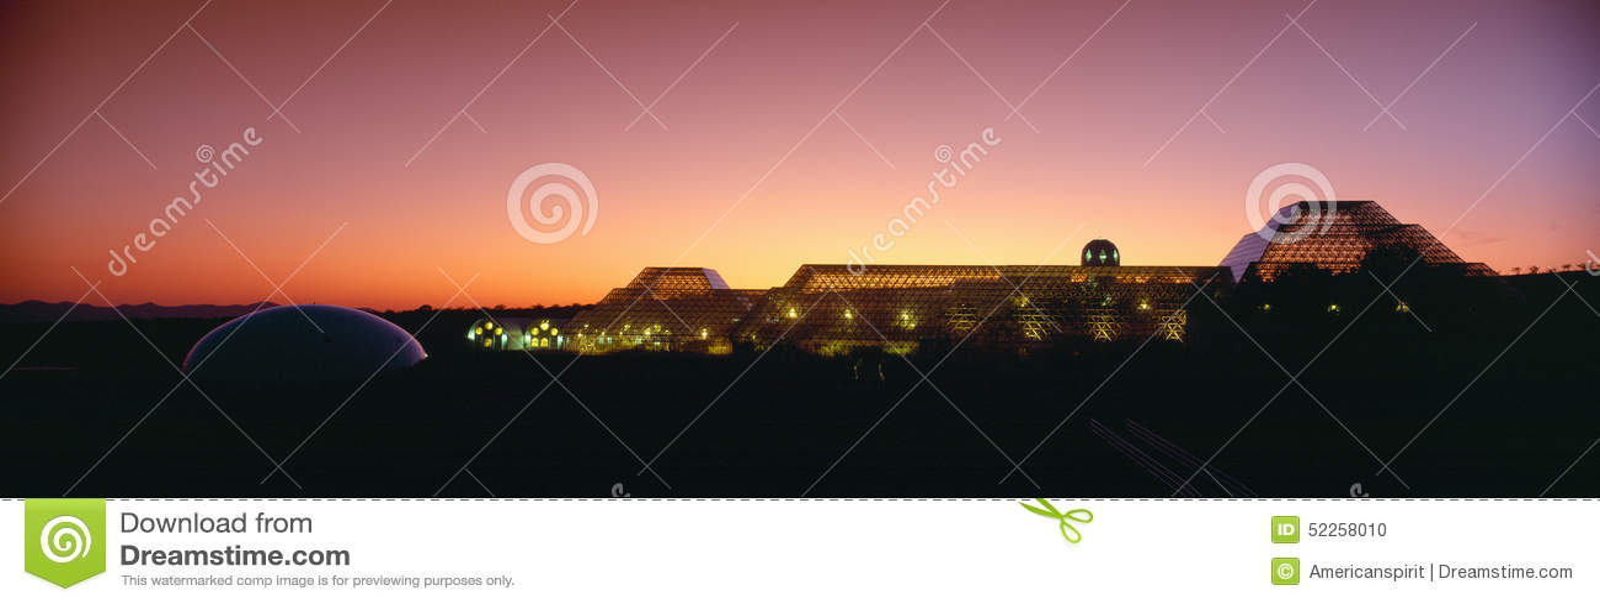 Biosphere 2 at Sunset, Arizona